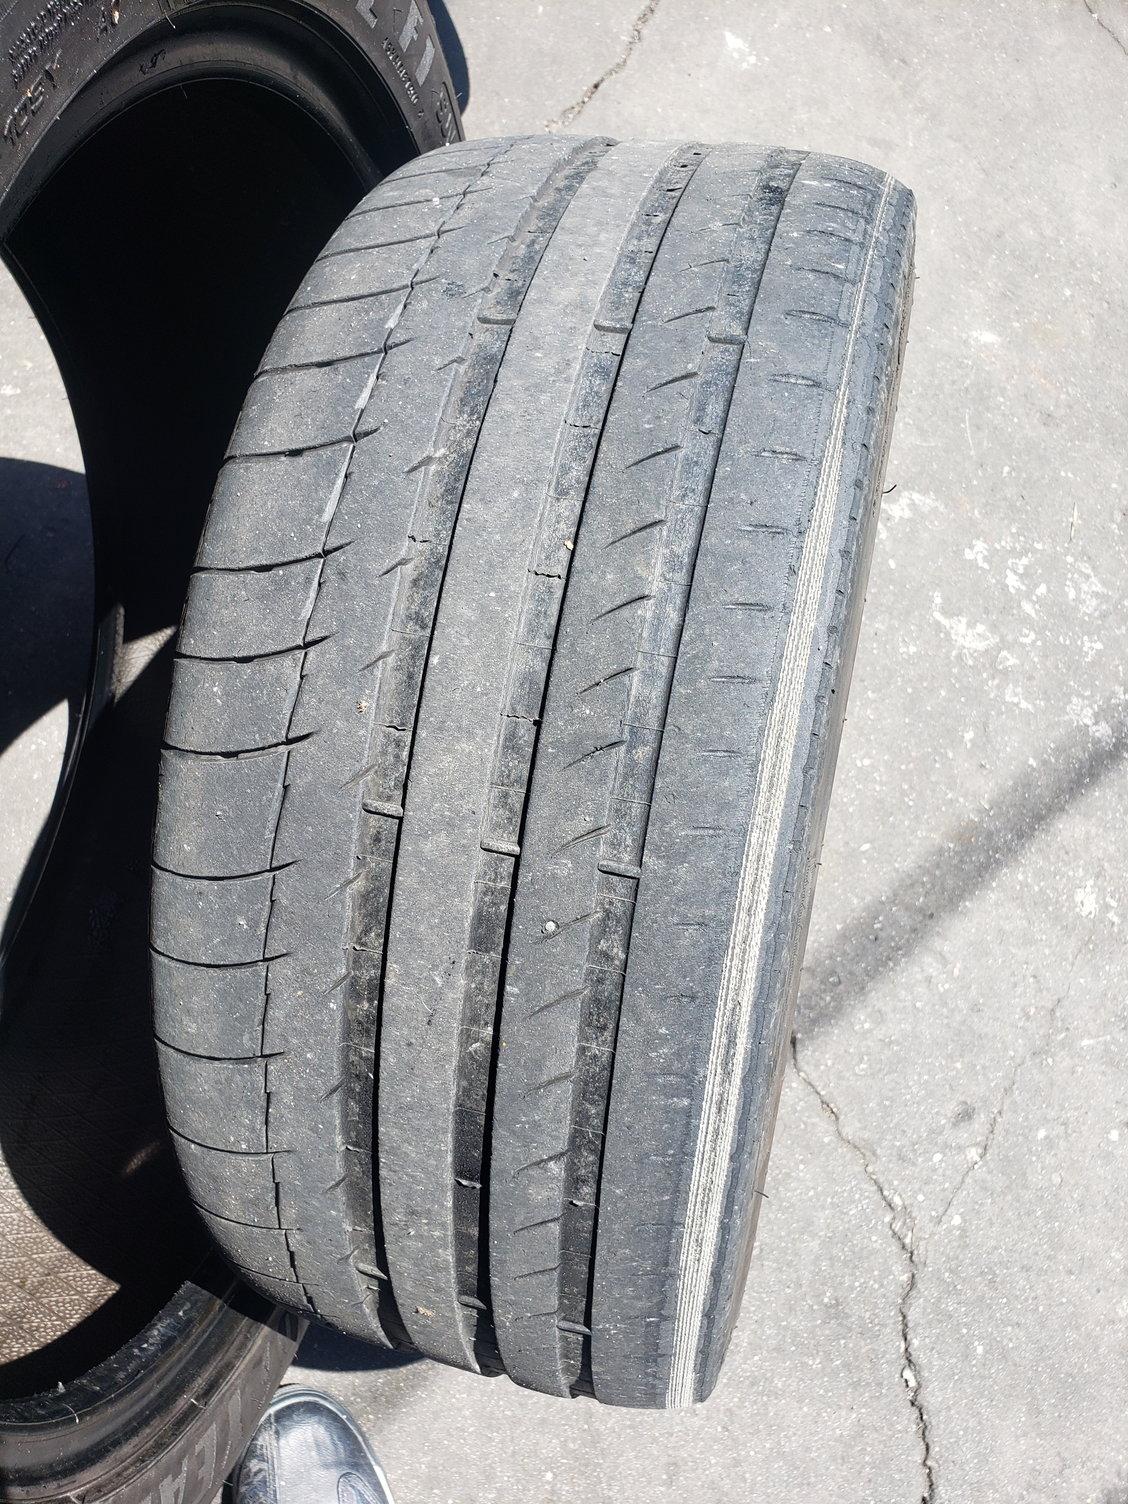 Bad wheel bearing? Opinions please! (Video+Audio